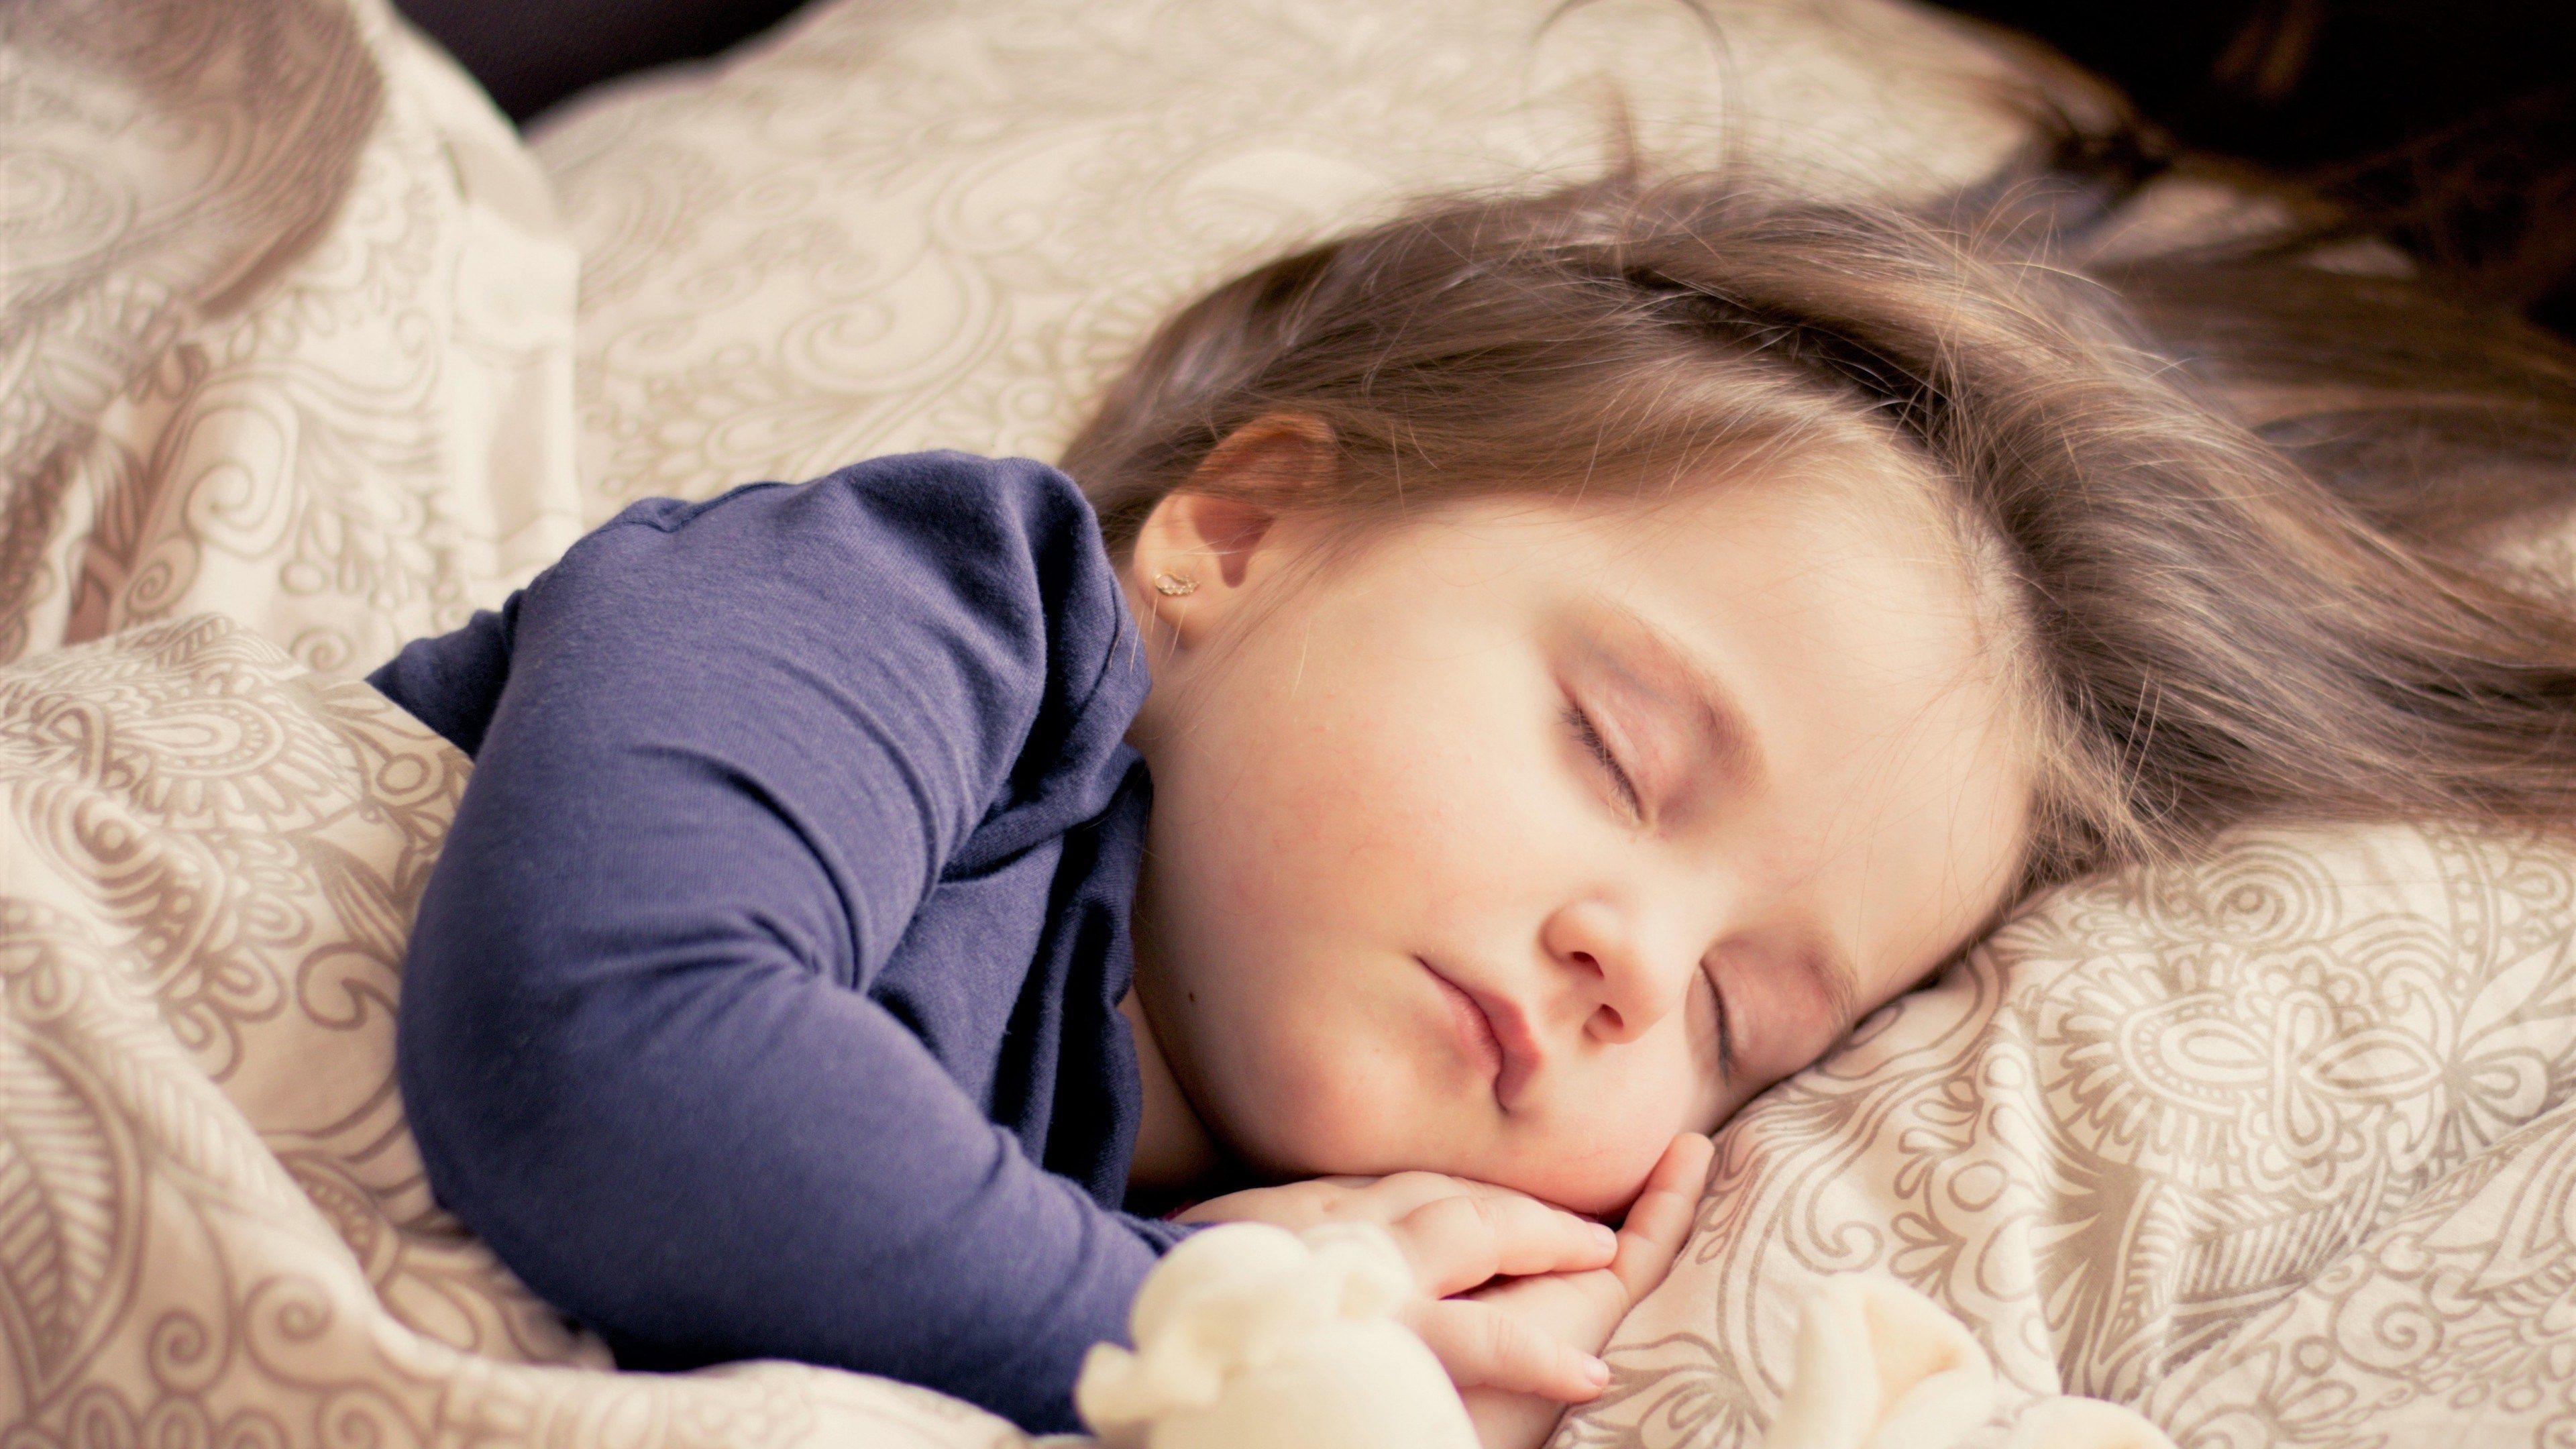 3840x2160 Child 4k Free Download Hd Desktop Wallpaper Baby Wallpaper National Nap Day Baby Death